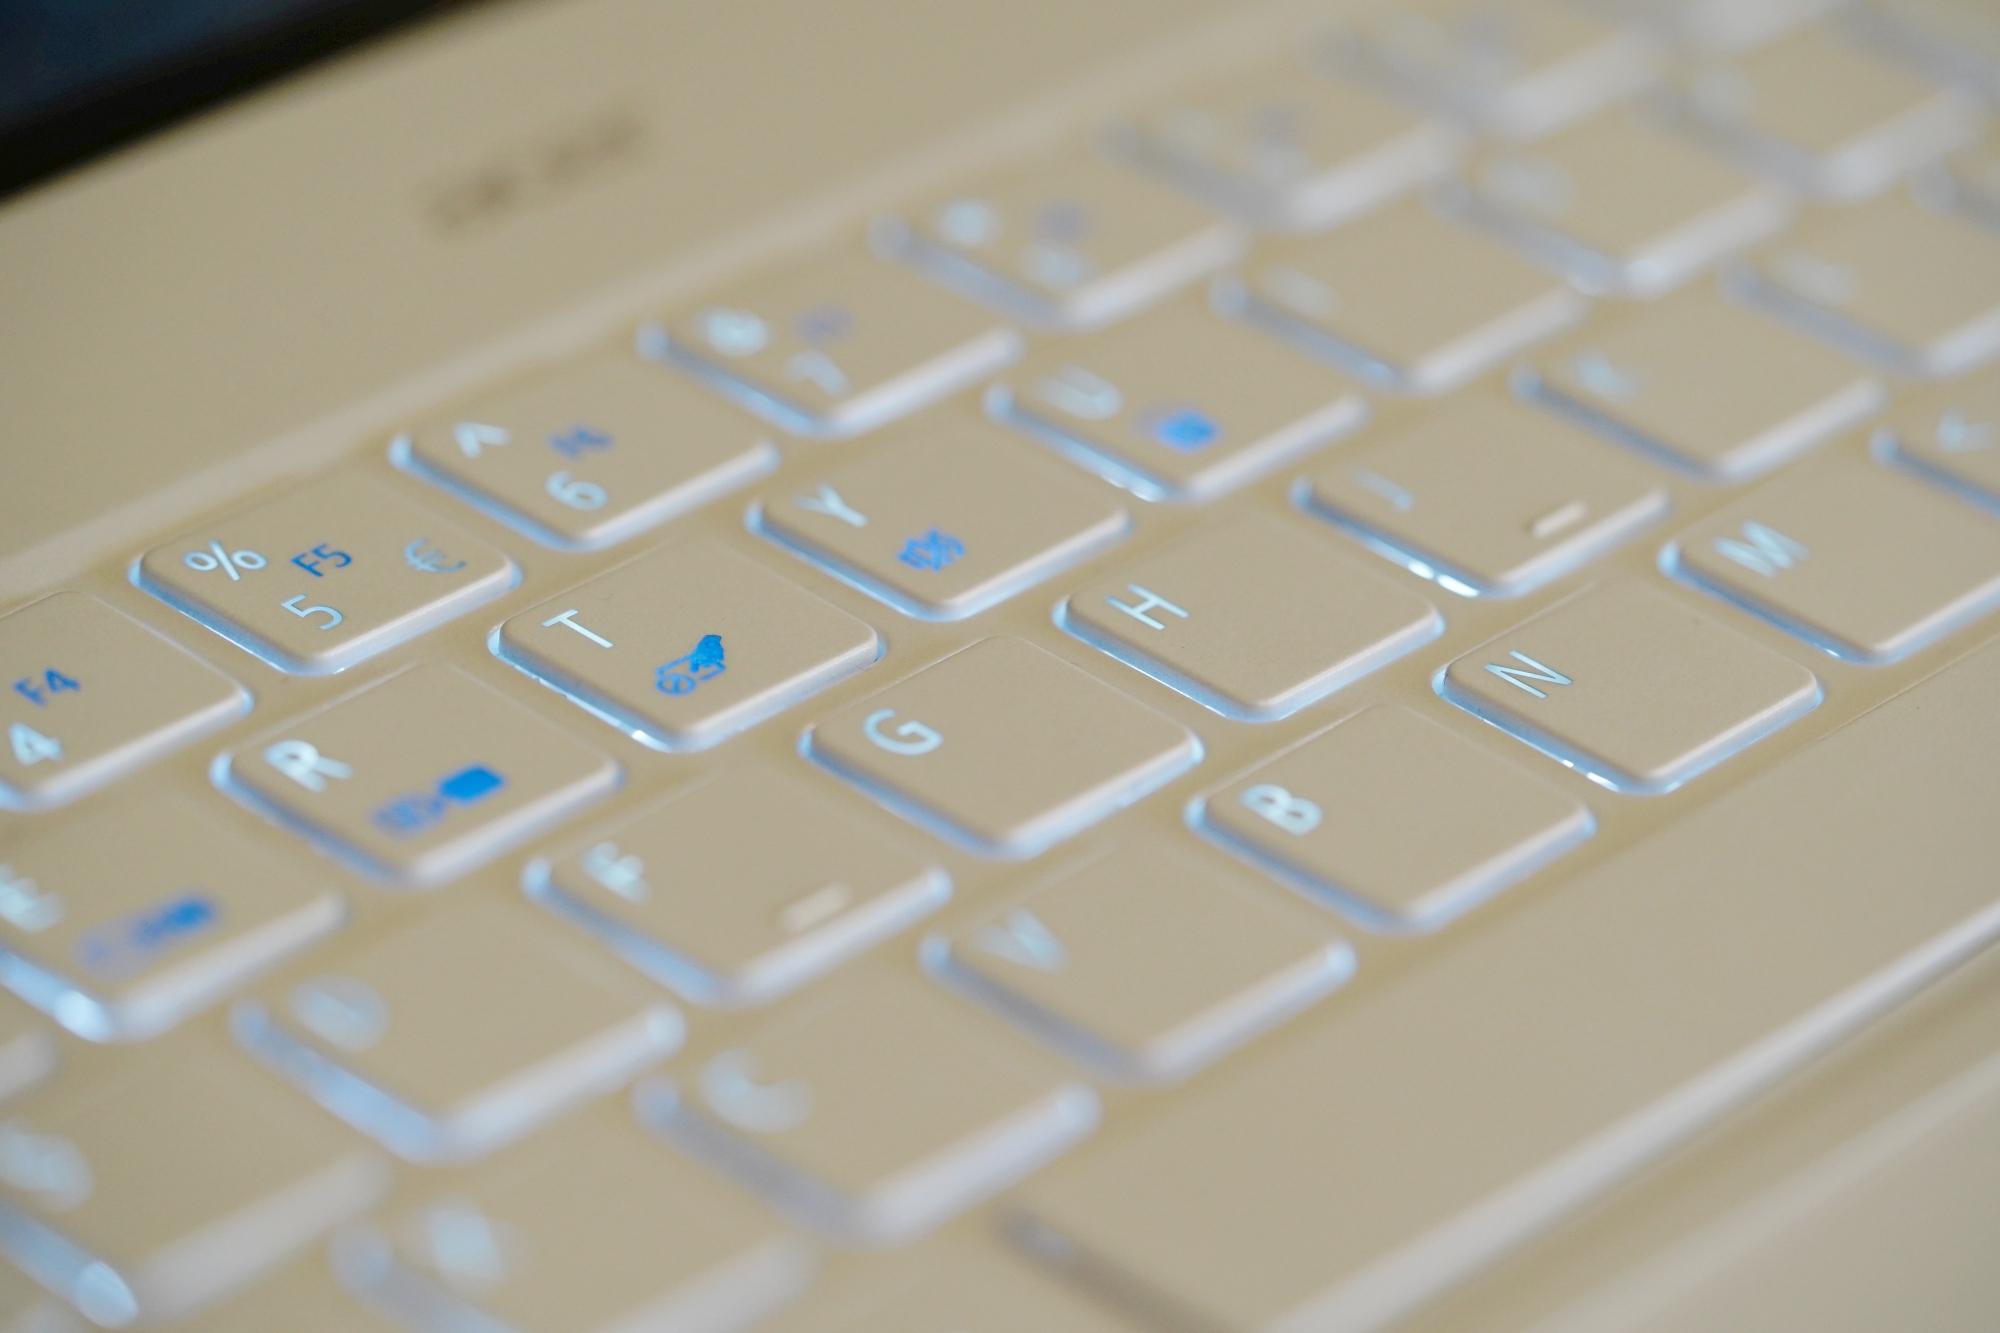 recenzja Acera Swift 7